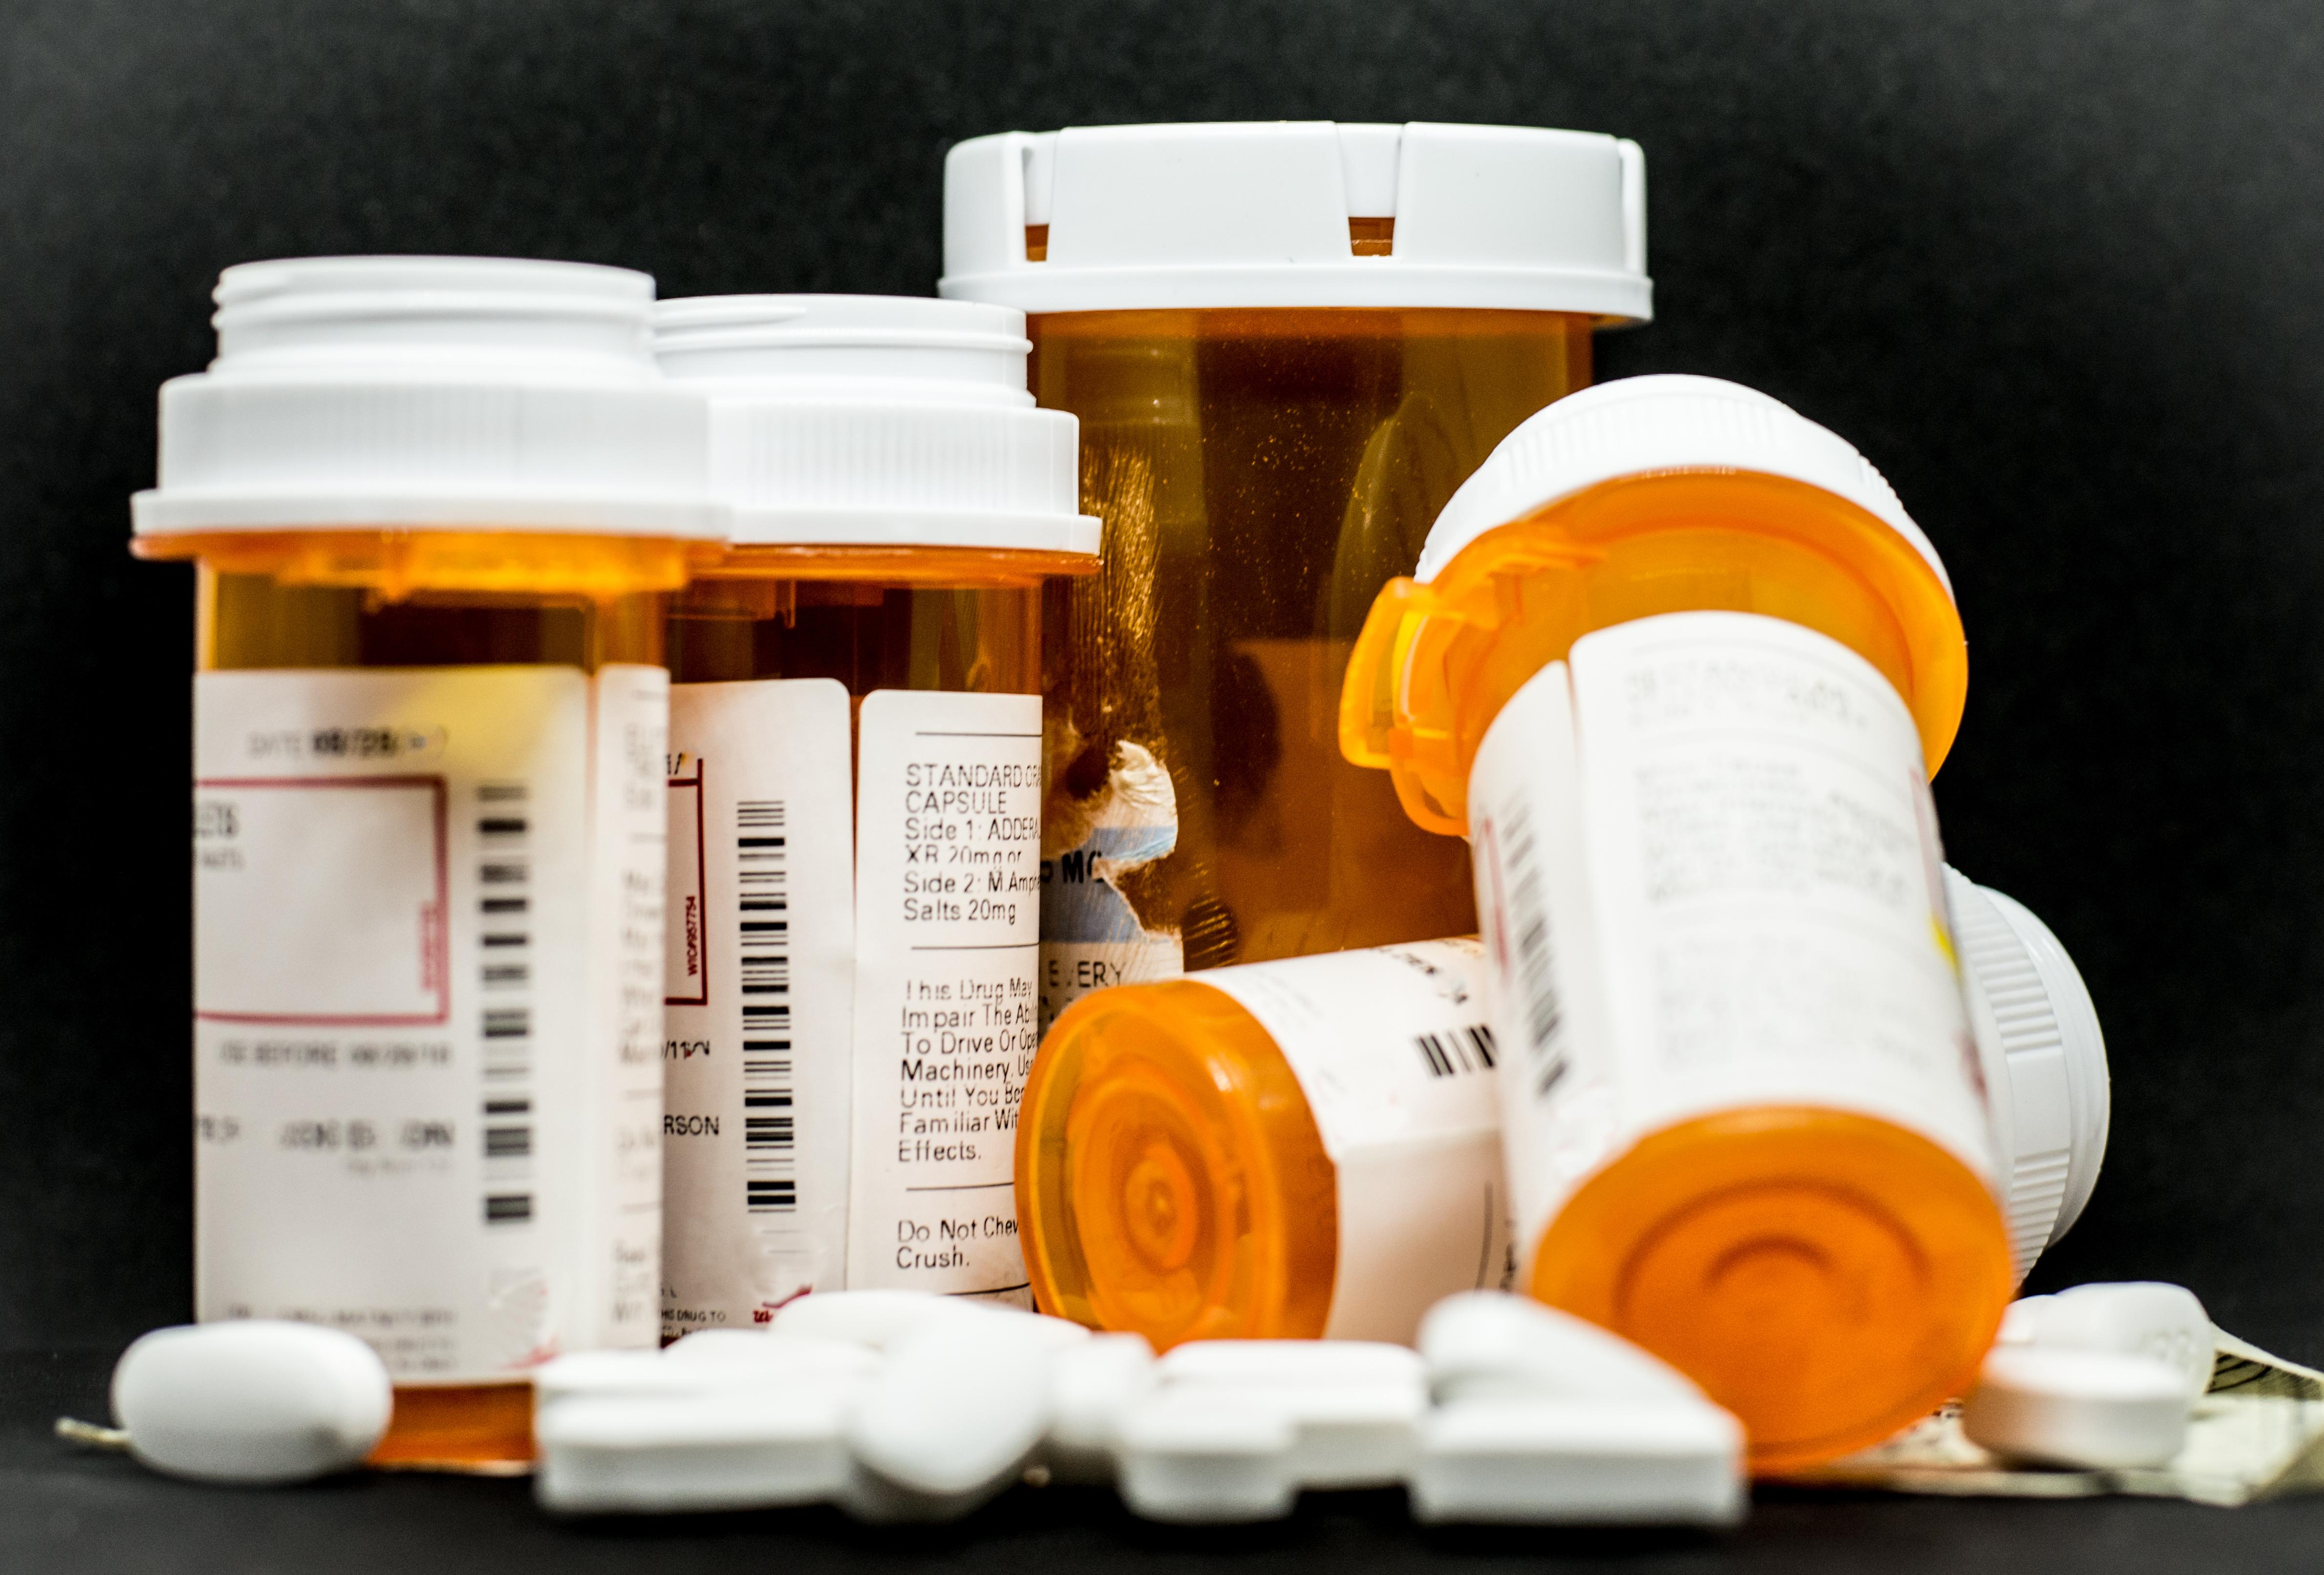 Walmart, Walgreens, CVS: retailers sued for role in opioid